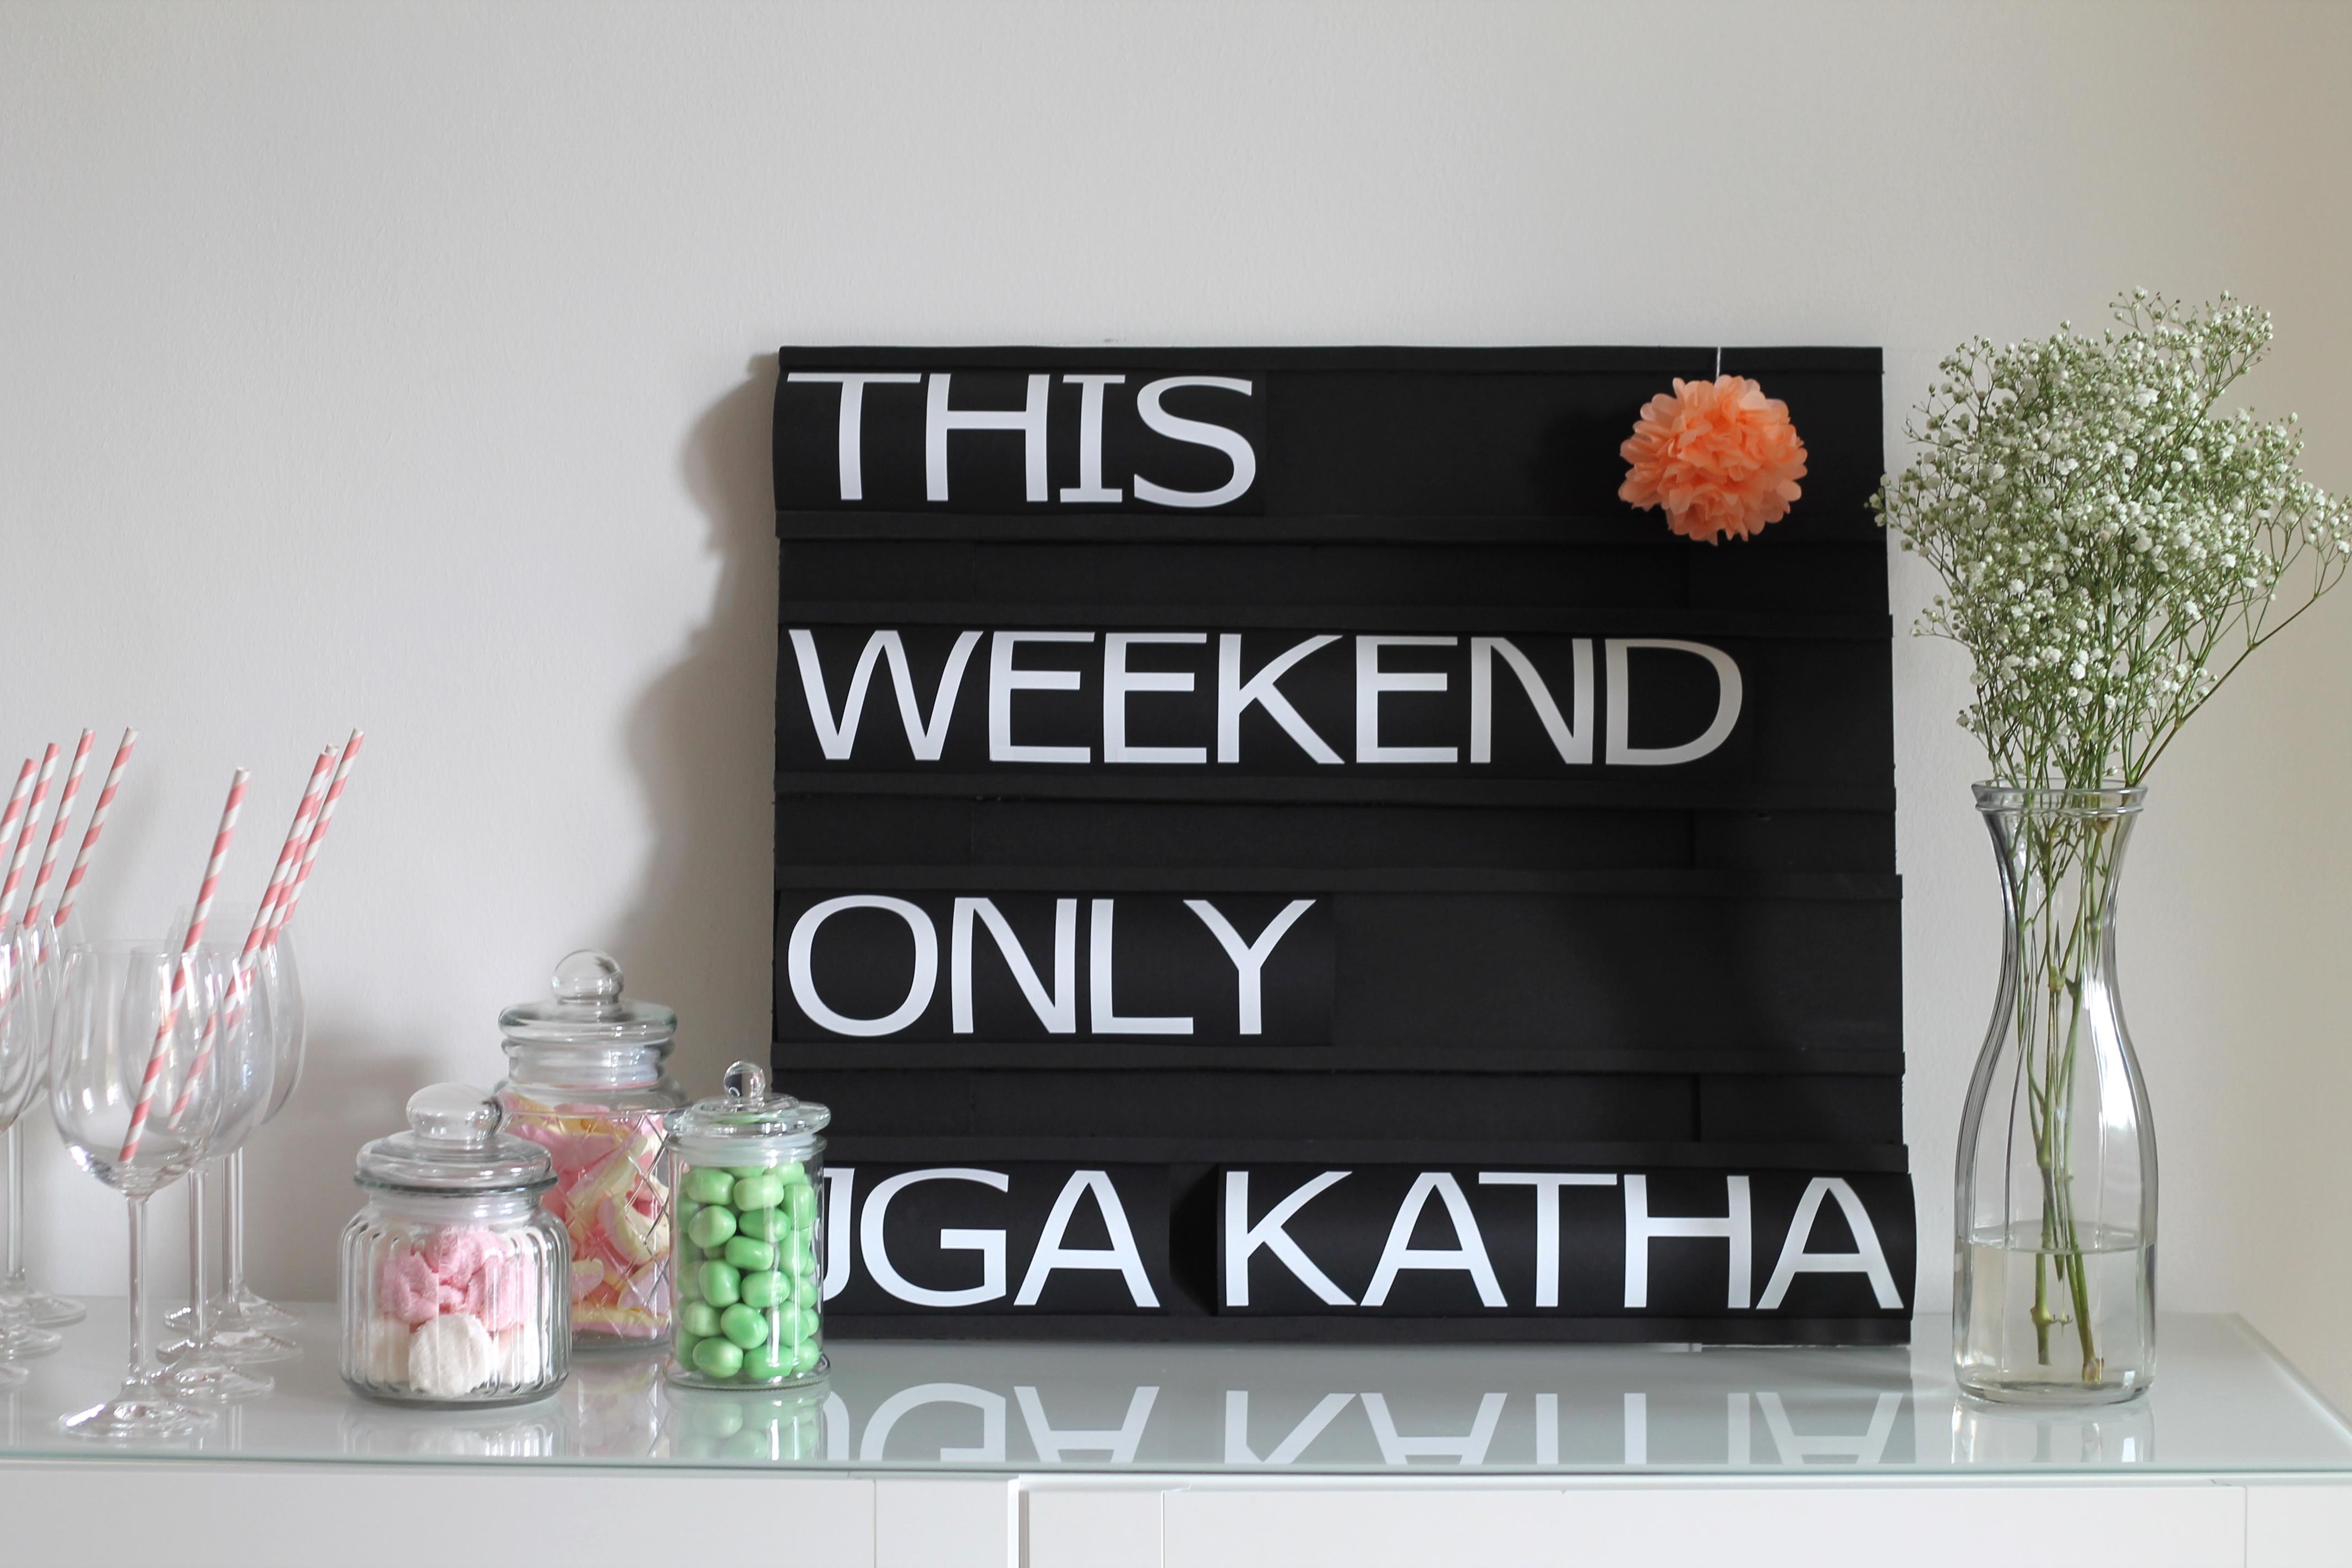 Katharinas Junggesellinnenabschied: Sweet Table & Dekoration